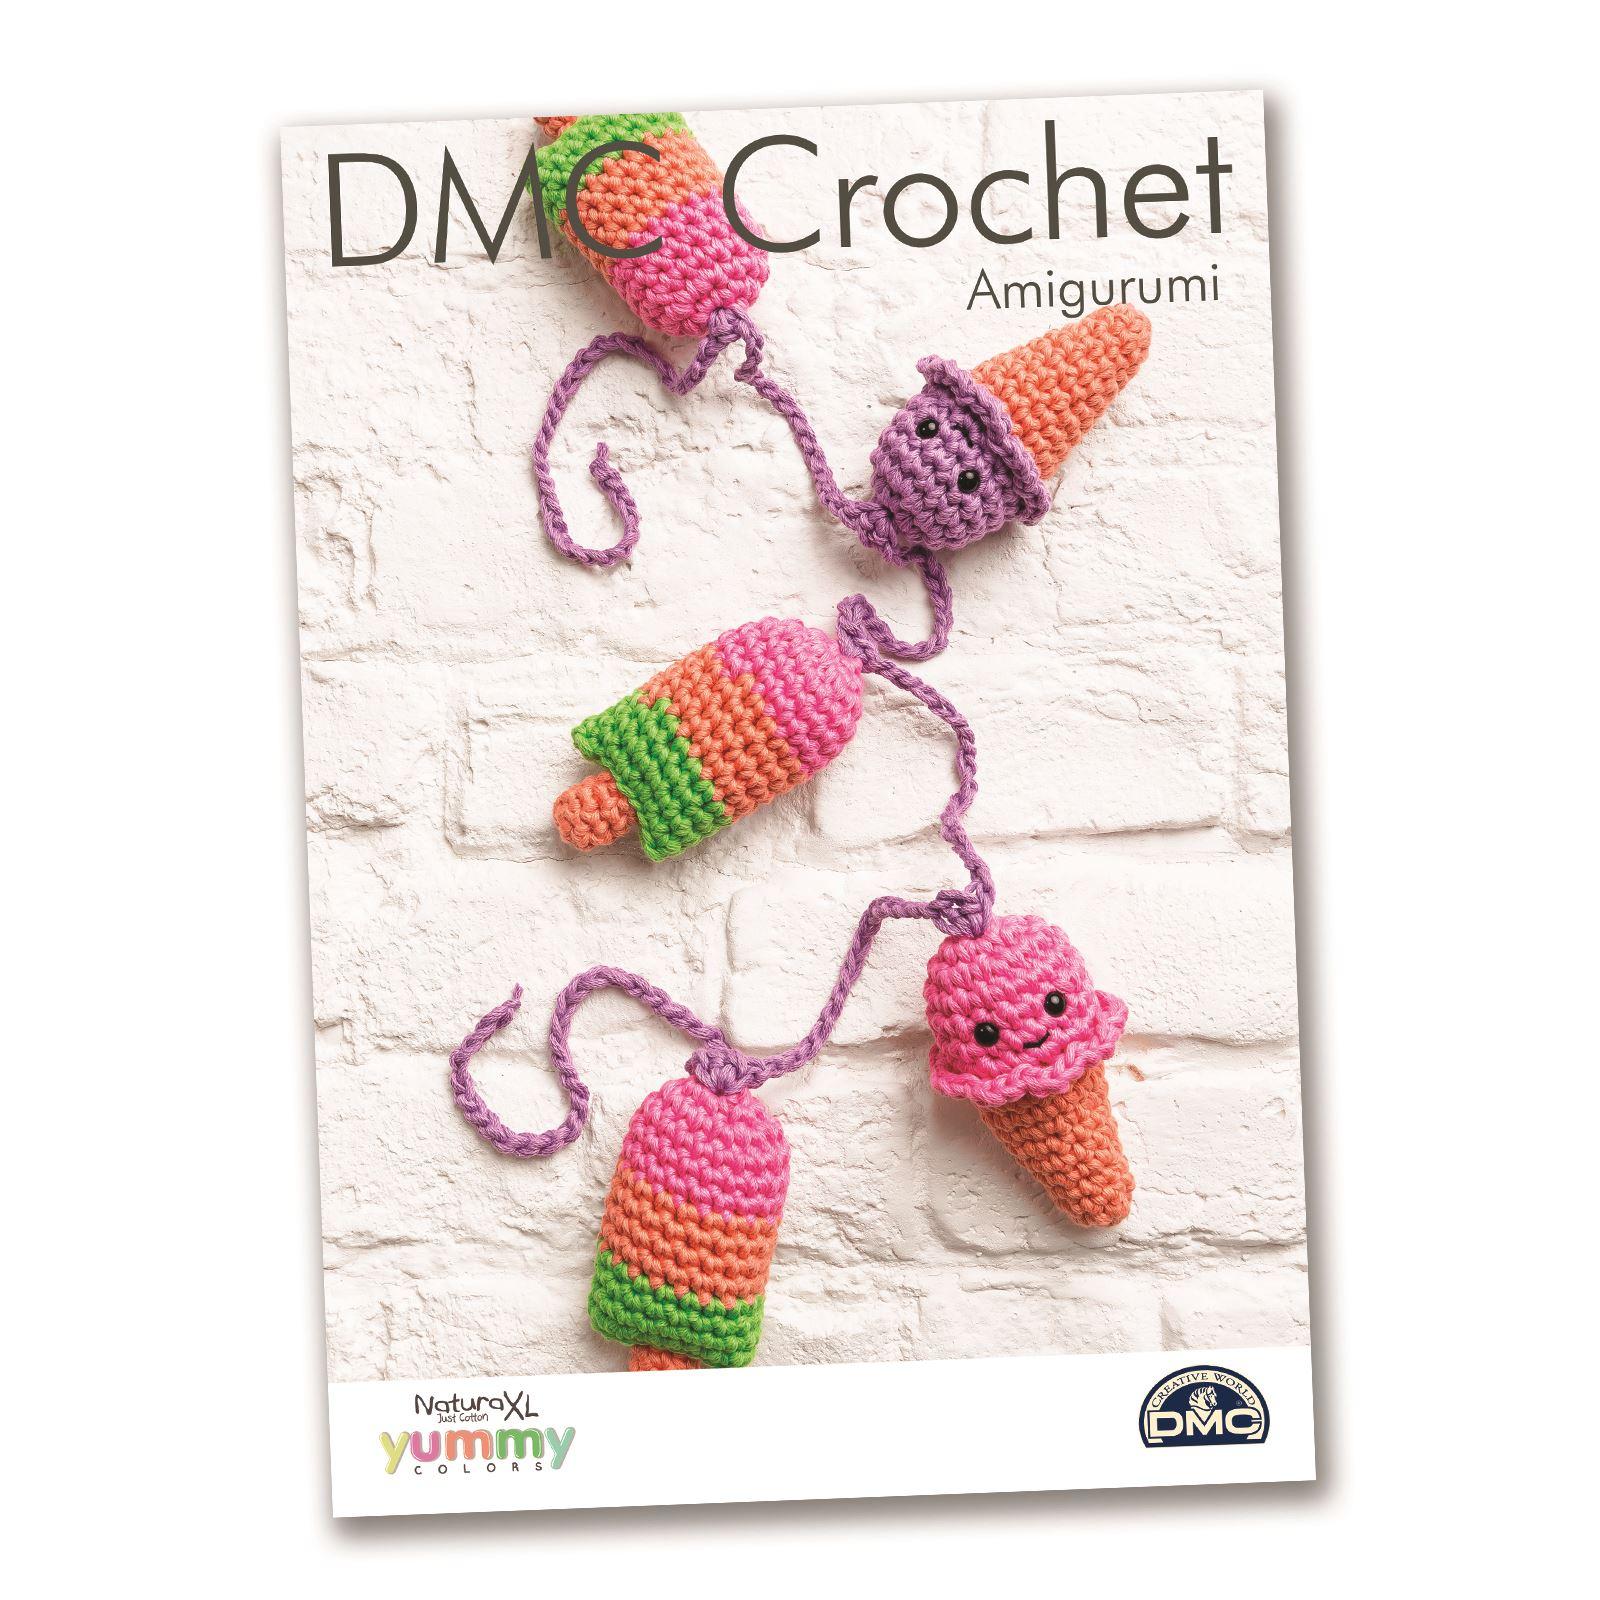 DMC Natura XL Yummy Crochet Patterns Amigurumi Home Decor ...